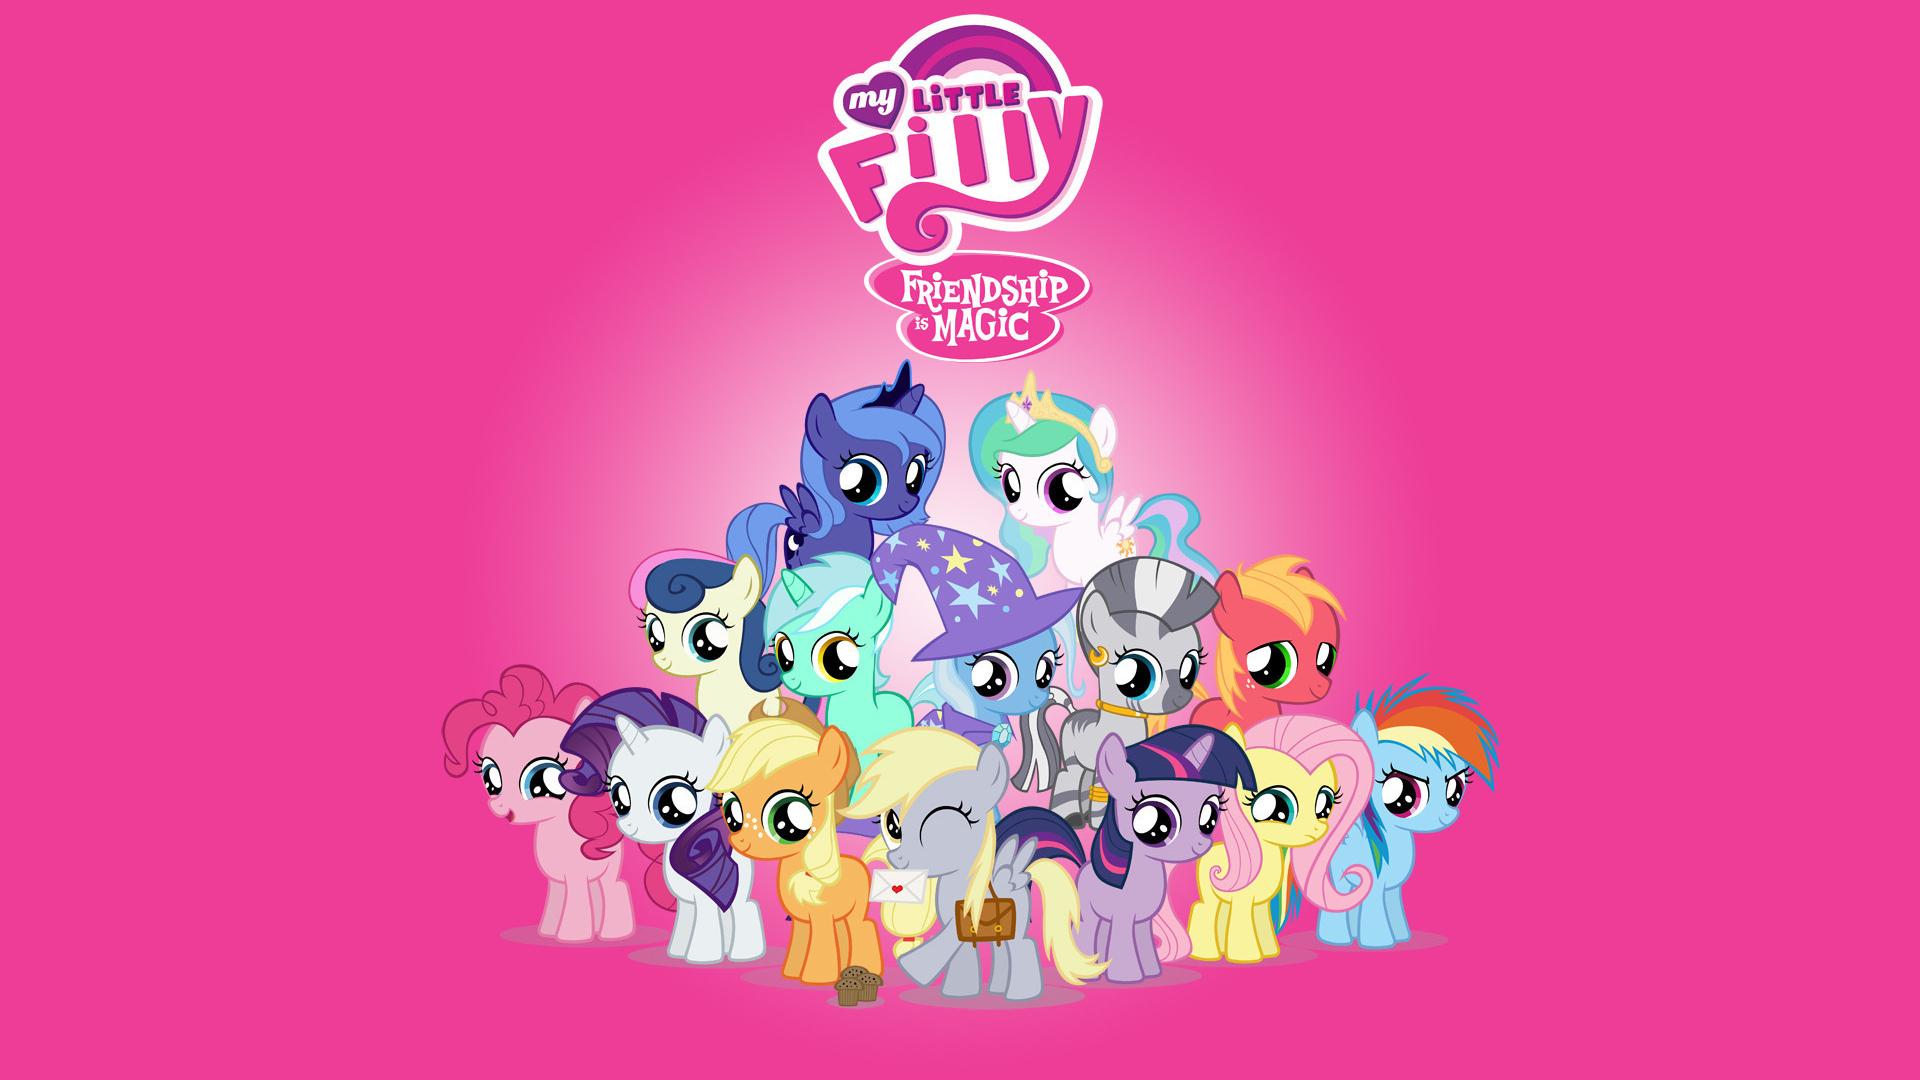 Free Download My Little Pony Cartoon Pink Wallpaper Hd Wallpaper